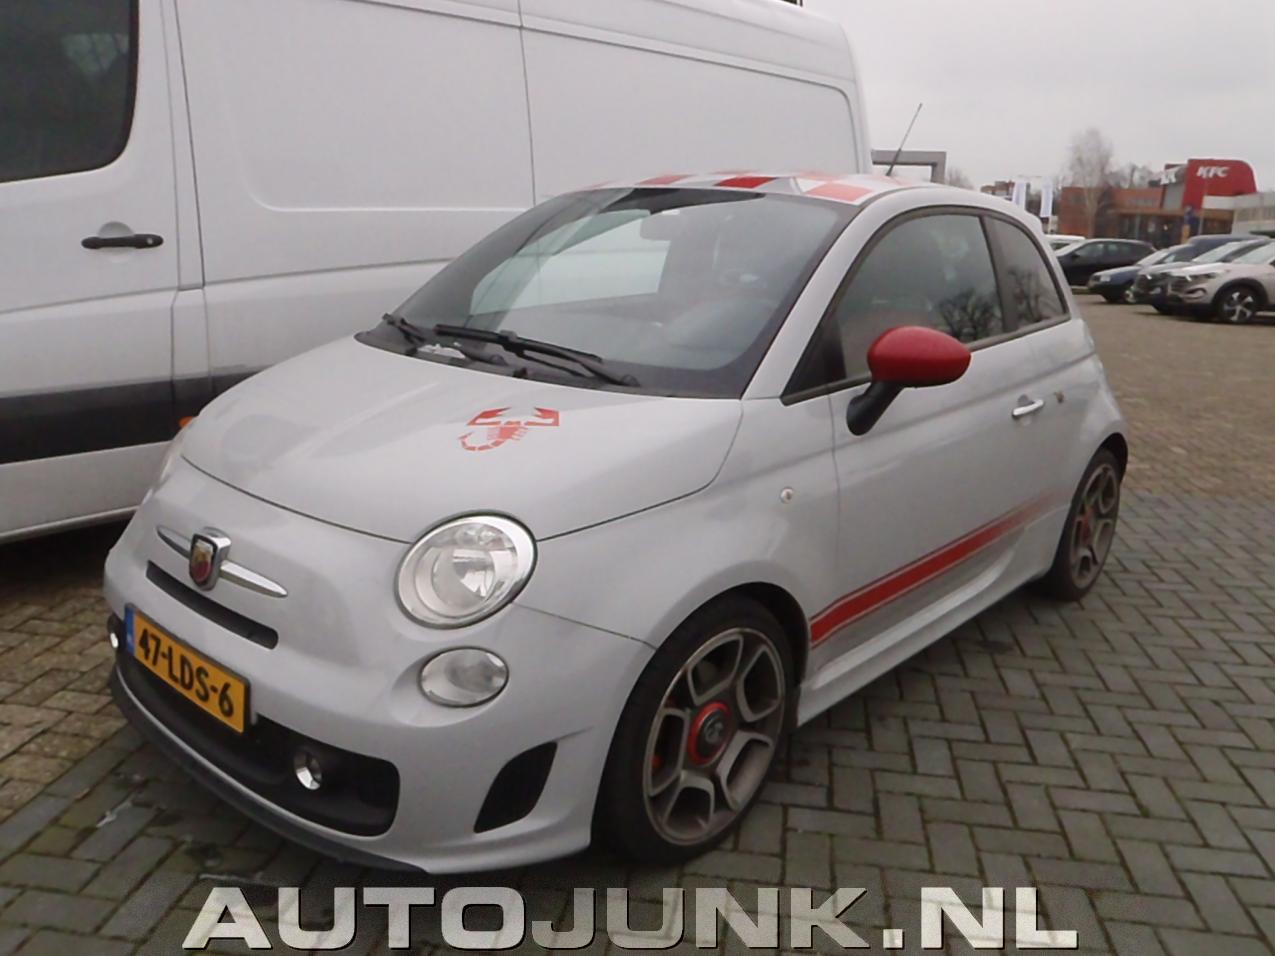 2010 Fiat 500 Abarth Grijs foto's » Autojunk.nl (160317)